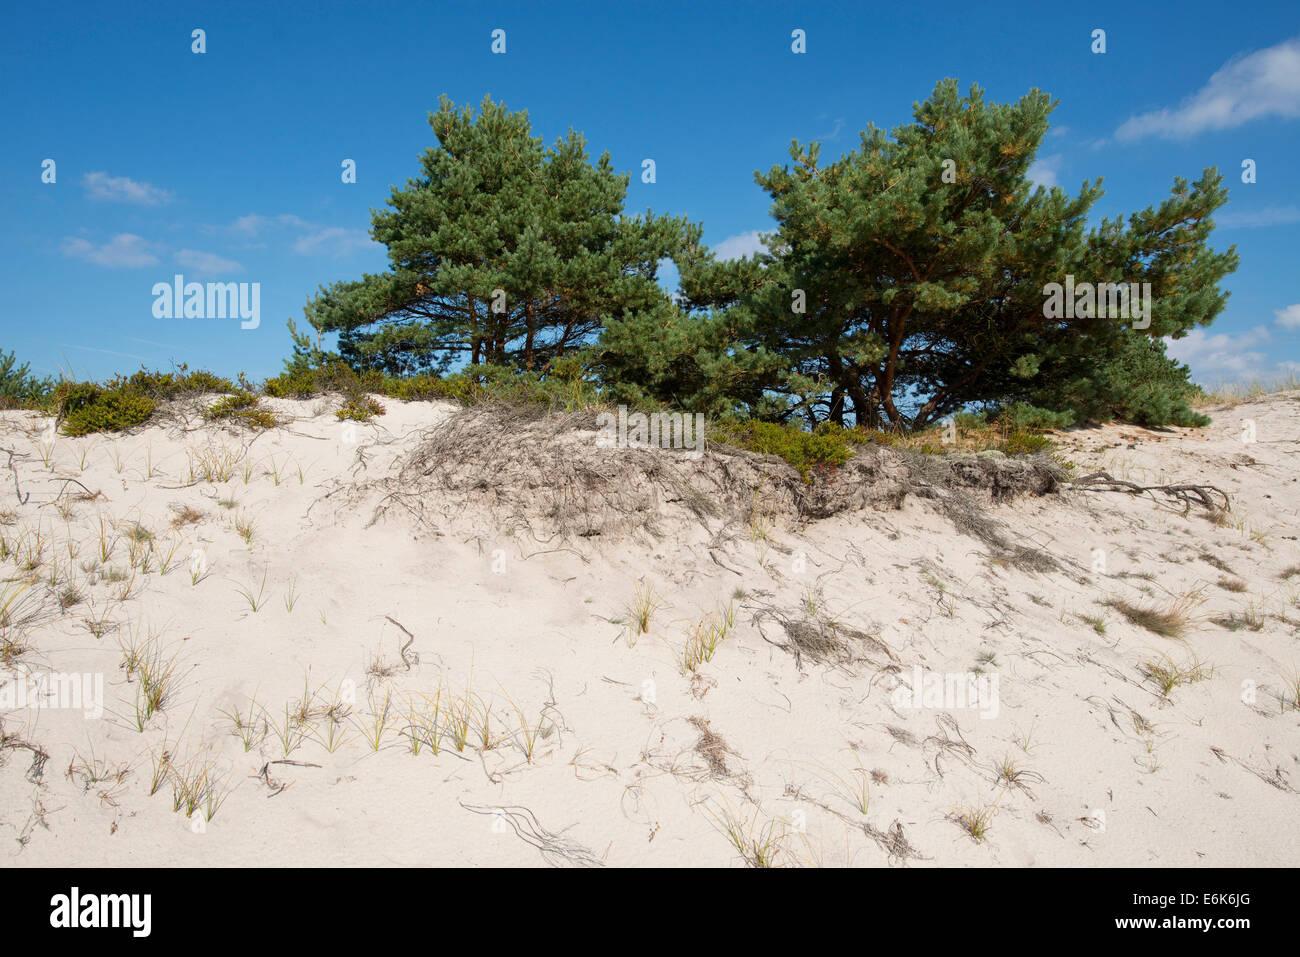 Dunes with Scots Pines (Pinus sylvestris), Darßer Ort, Darß, Western Pomerania Lagoon Area National Park - Stock Image